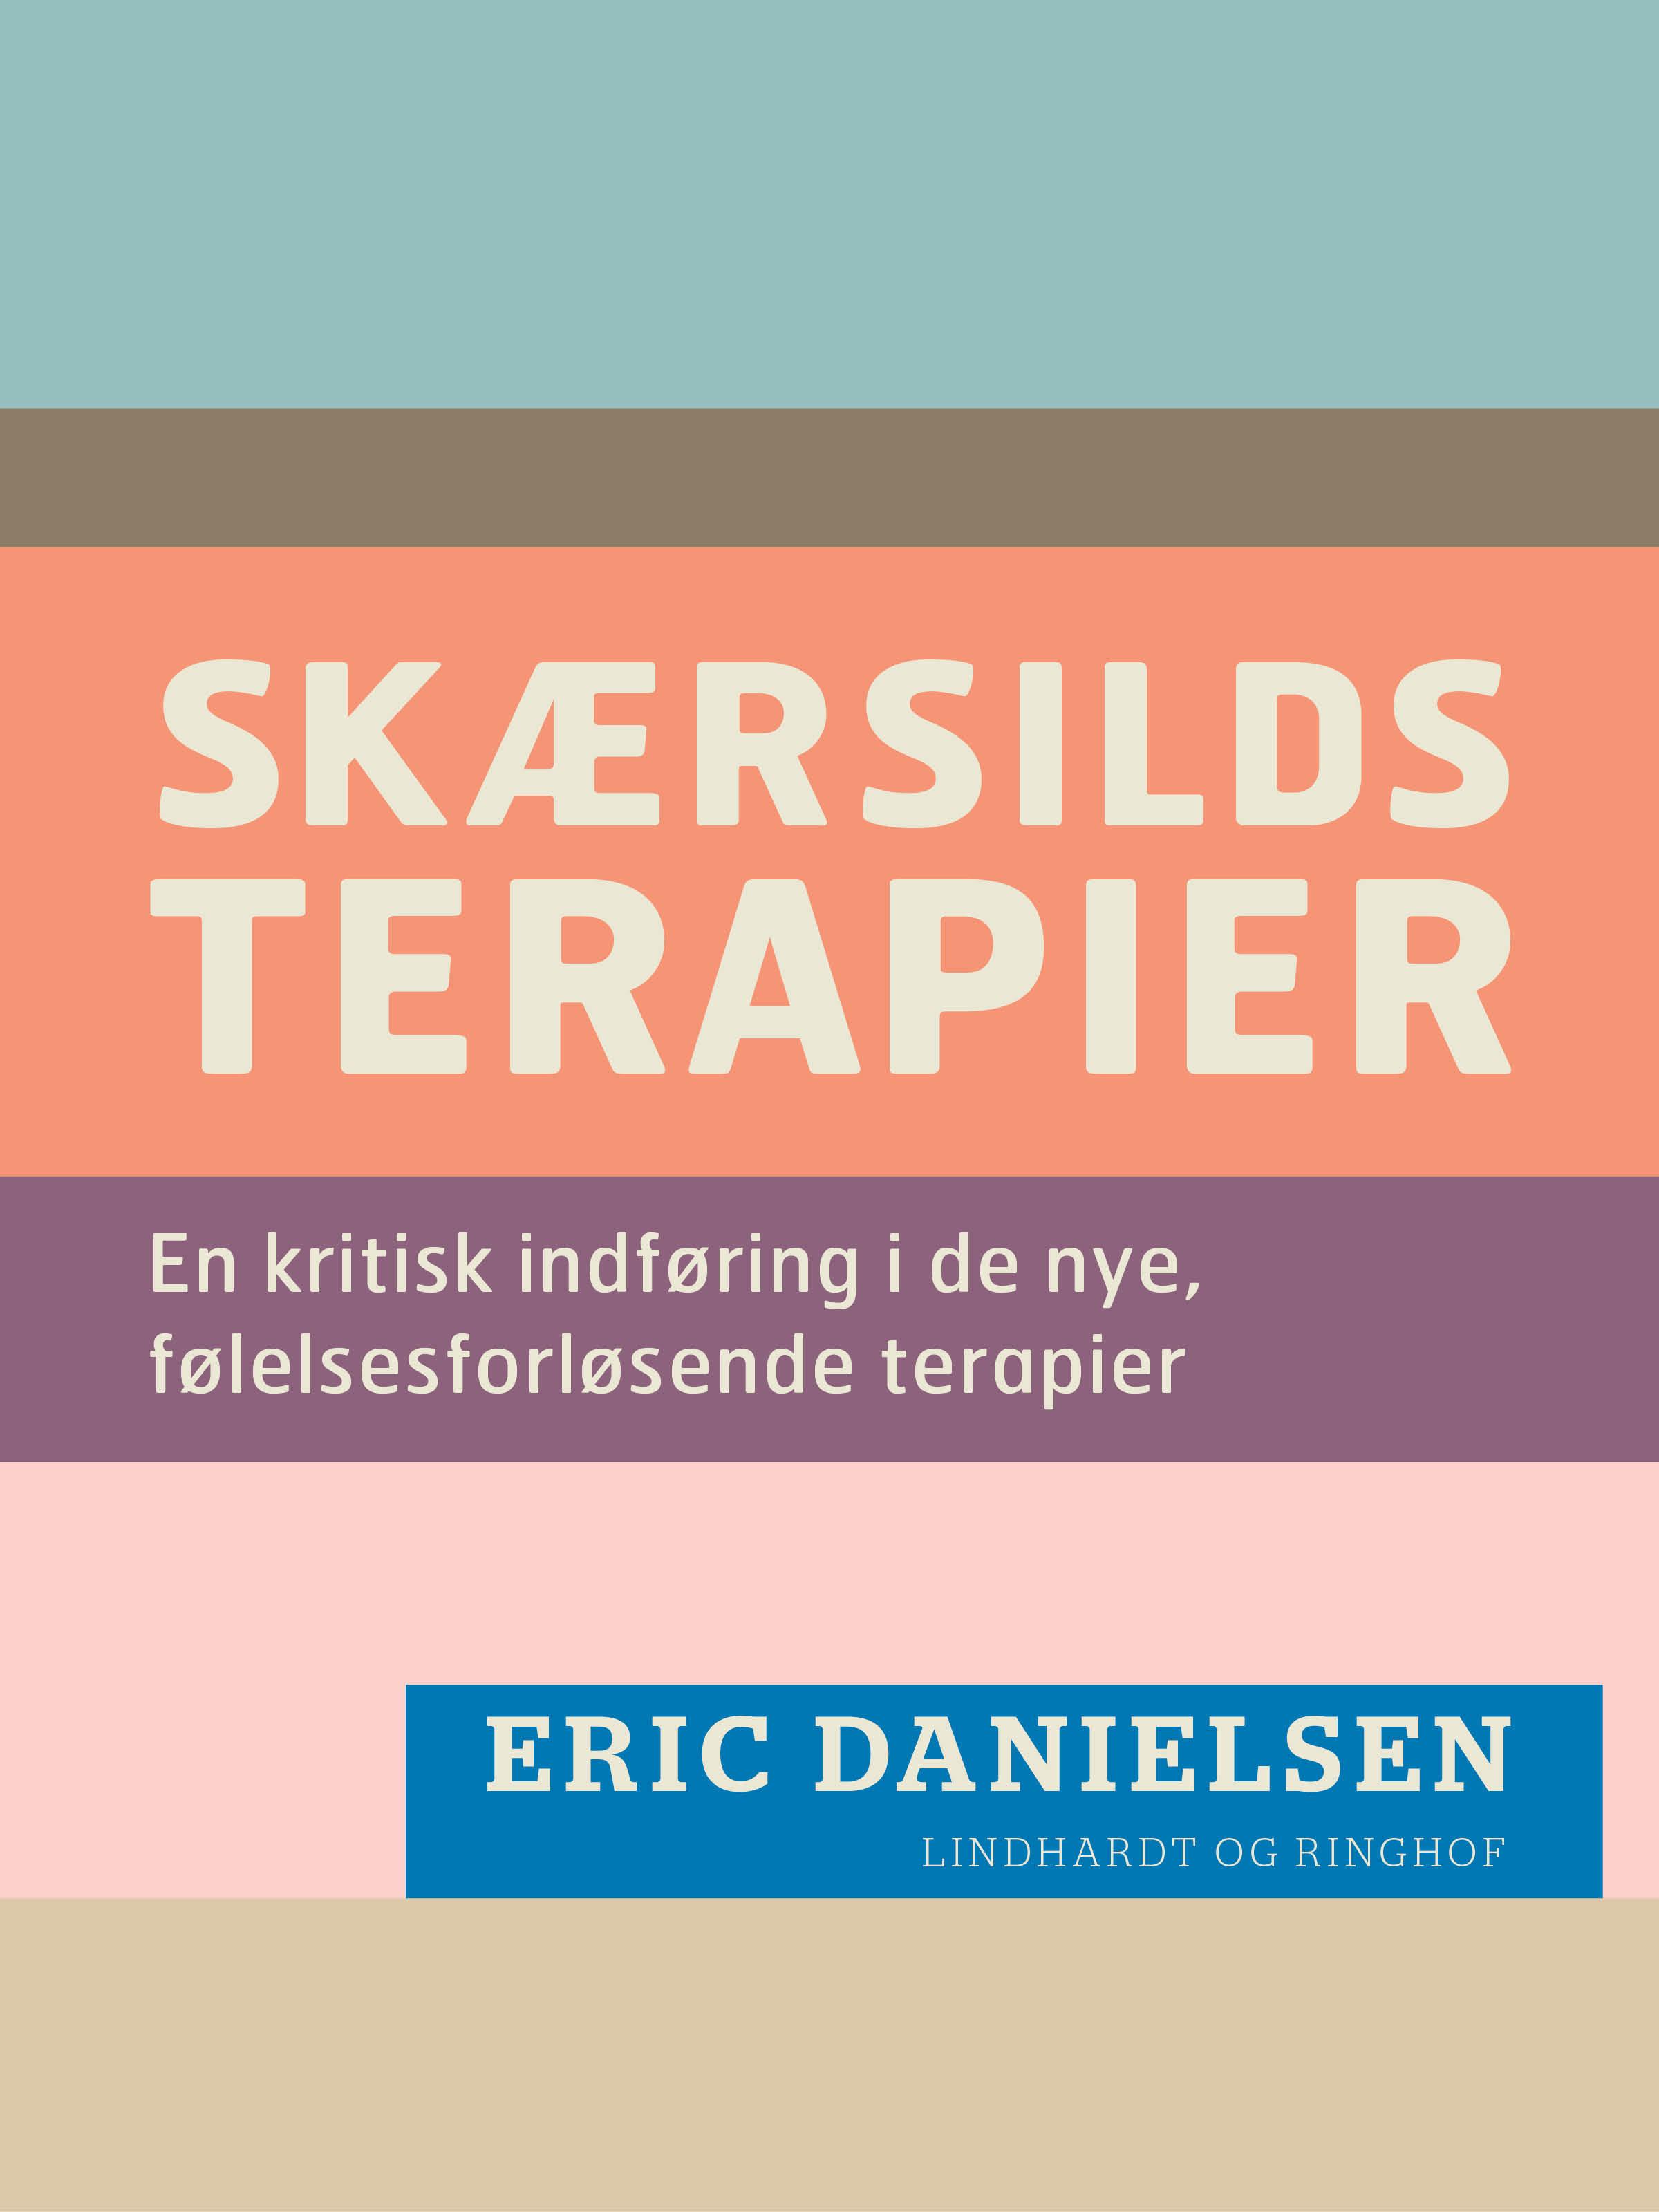 Skærsilds-terapier: en kritisk indføring i de nye, følelsesforløsende terapier - E-bog